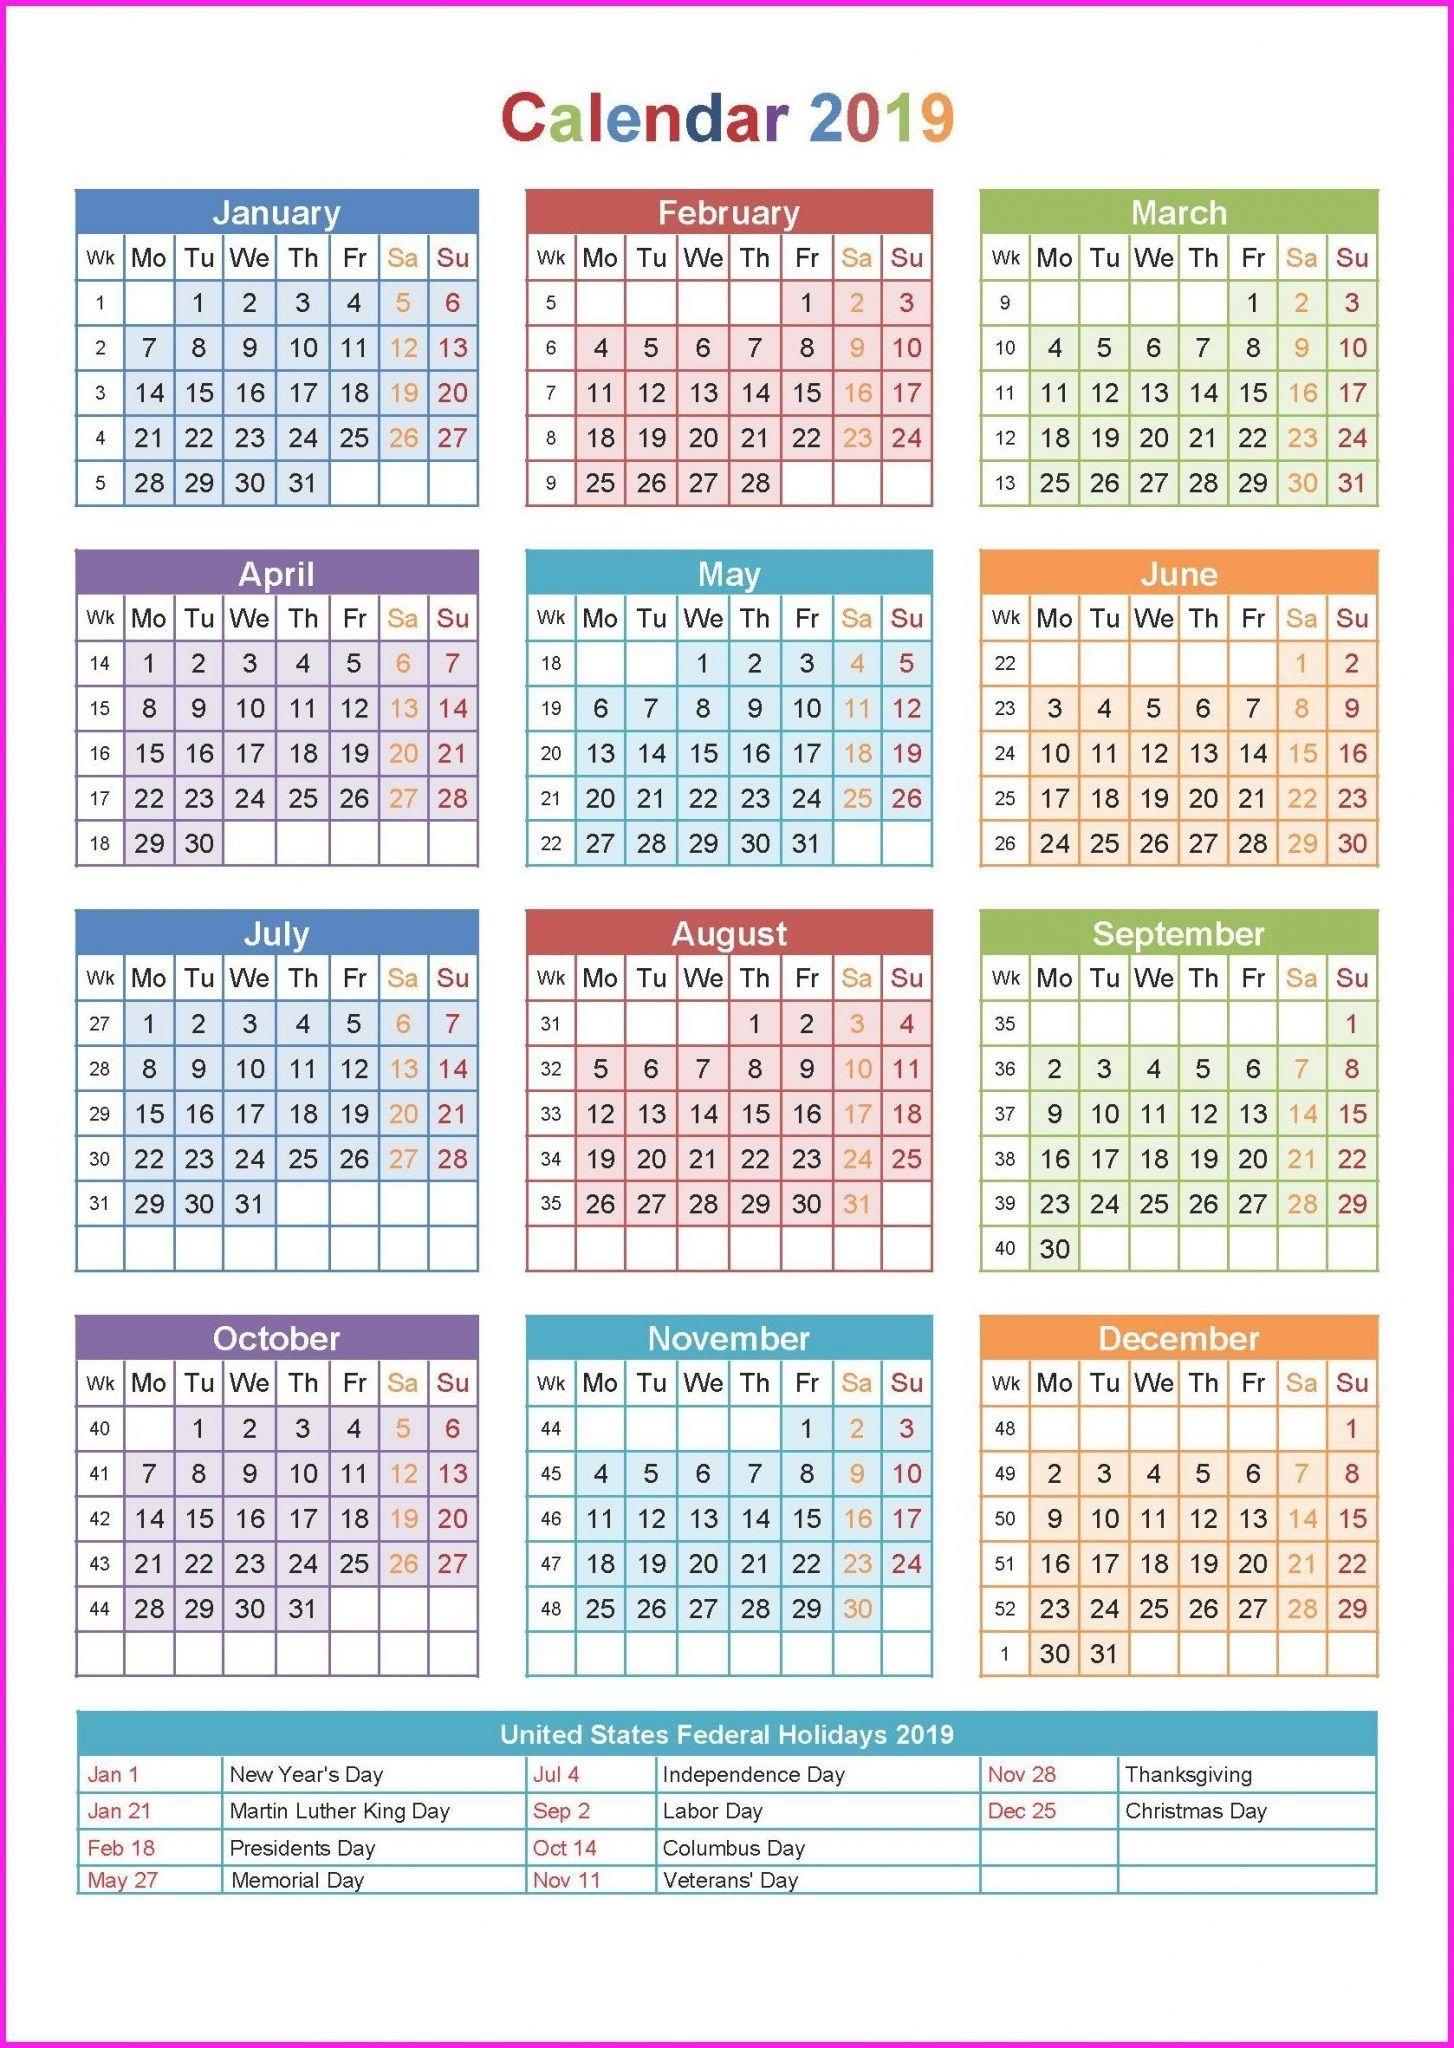 Yearly 2019 Calendar Printable | Top 10 Free 2019 Calendar Printable with Free Printable Calendar Templates 8 X 10